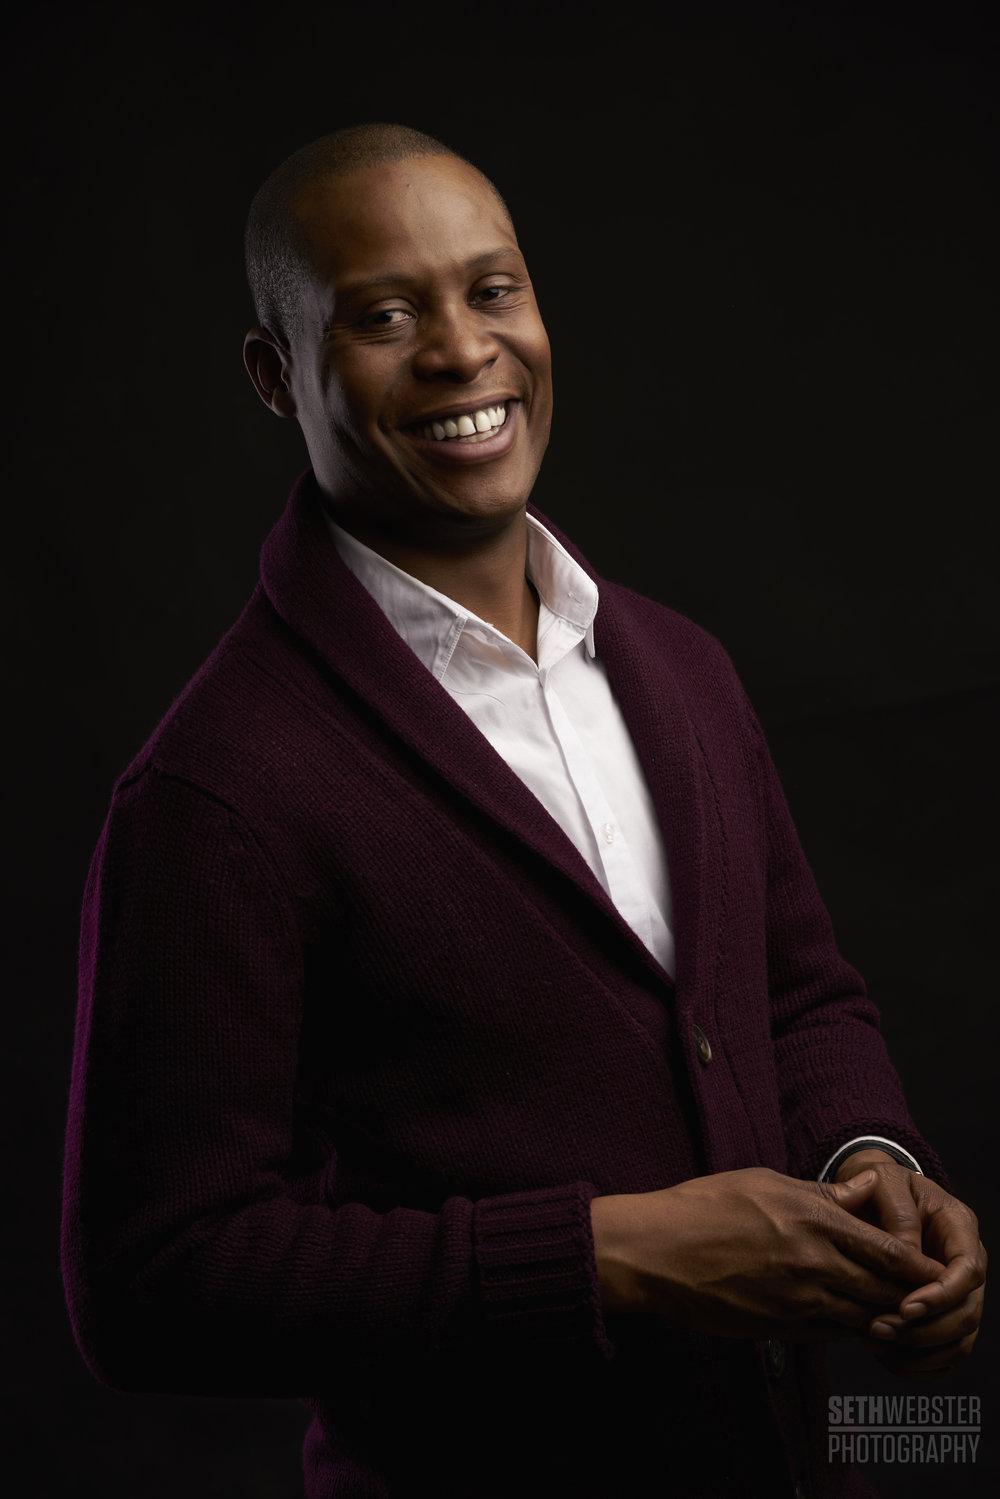 Darnell Jefferson, Newscaster, Portrait